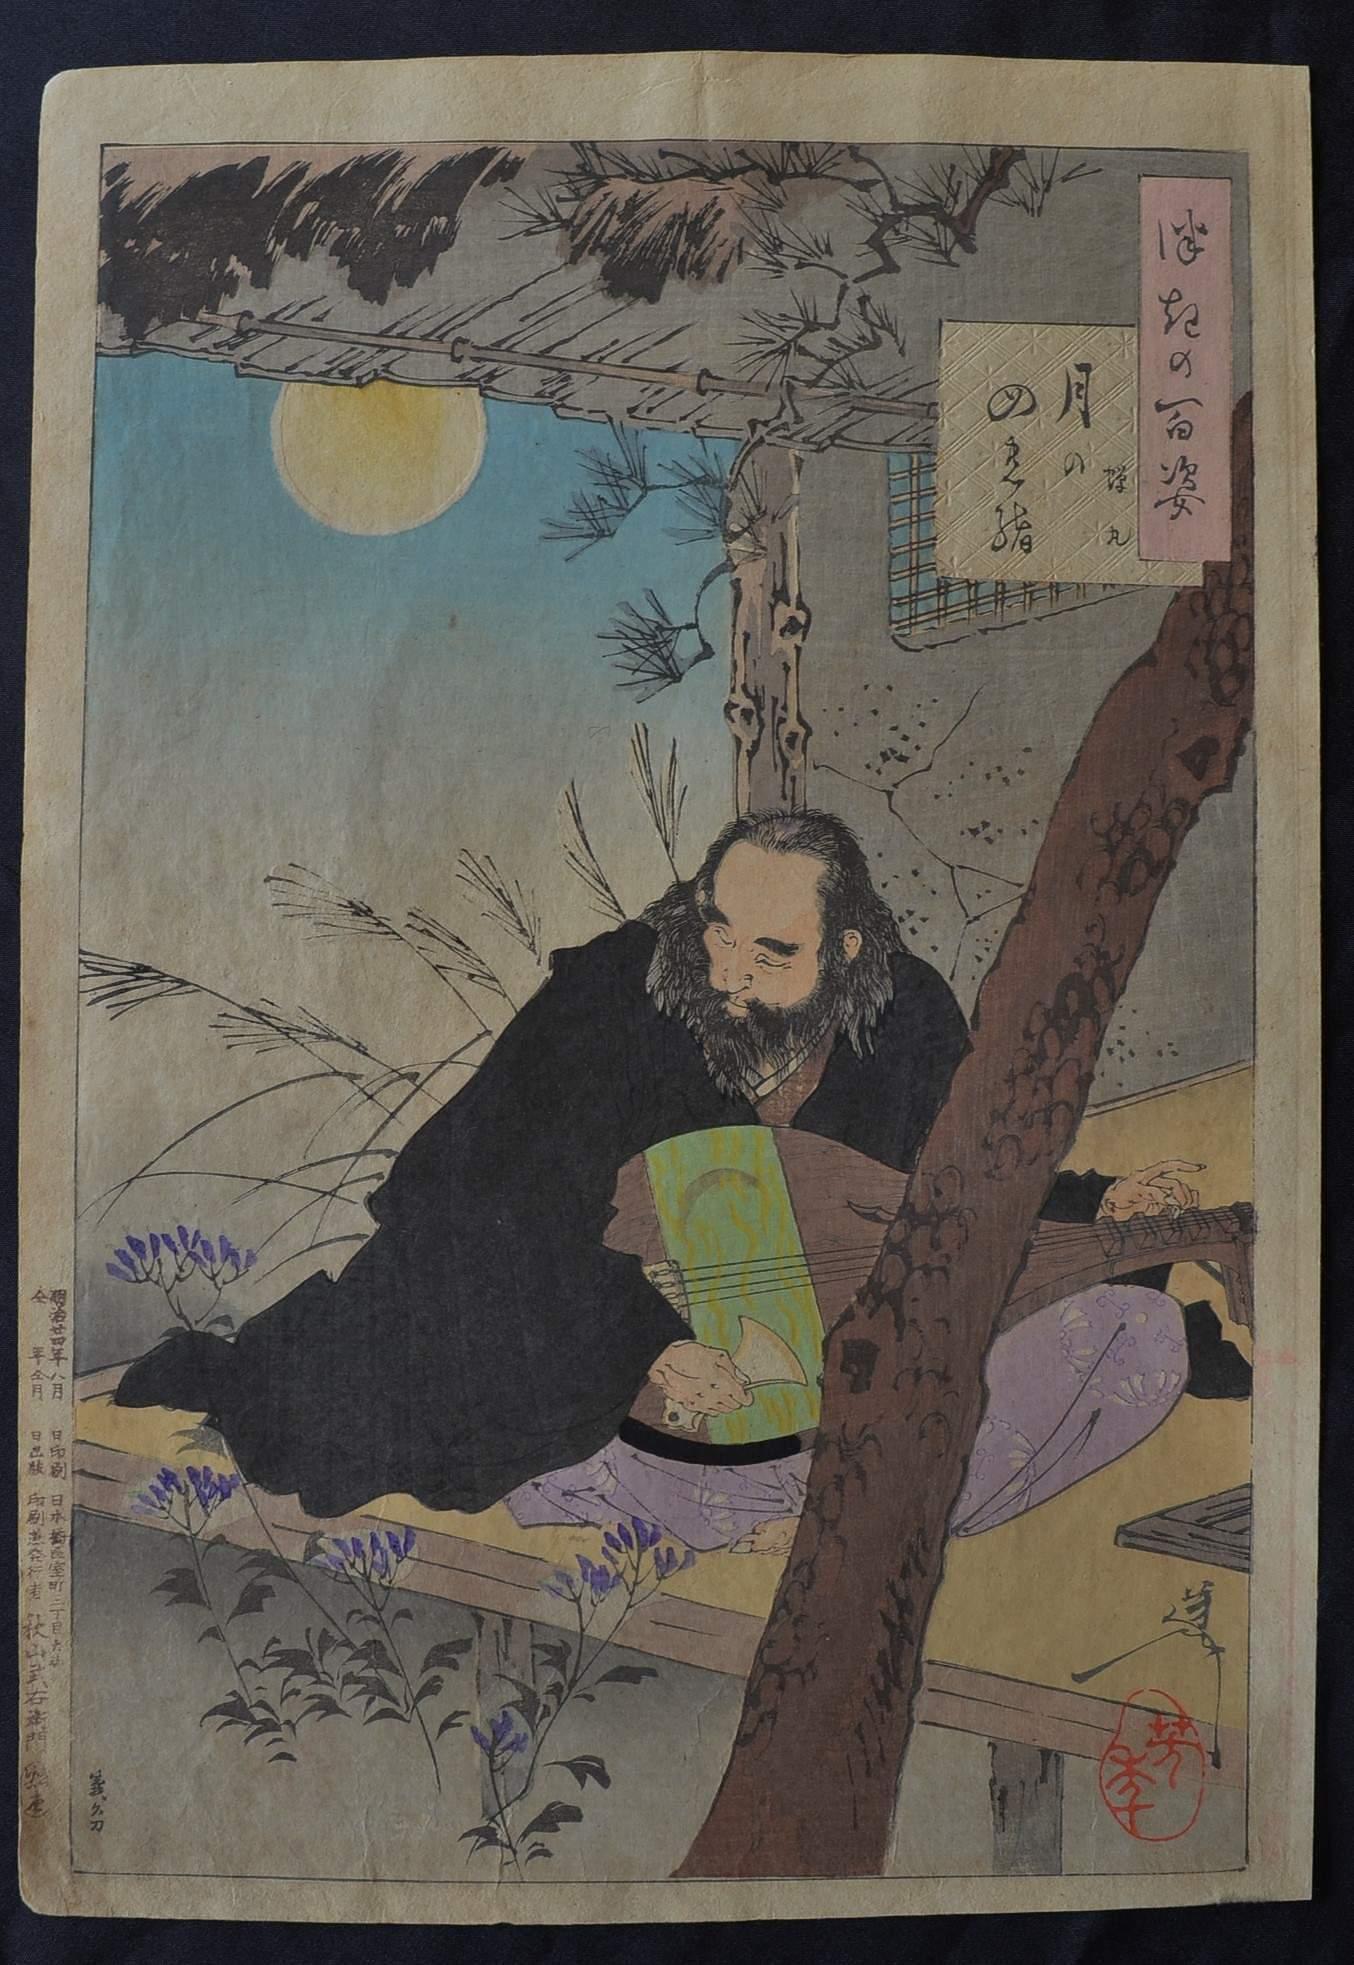 TAISO YOSHITOSHI: #P4087 TSUKI NO YOTSU NO O-SEMIMARU - THE MOONS FOUR STRINGS DATED 1891 FROM 100 ASPECTS OF THE MOON SERIES